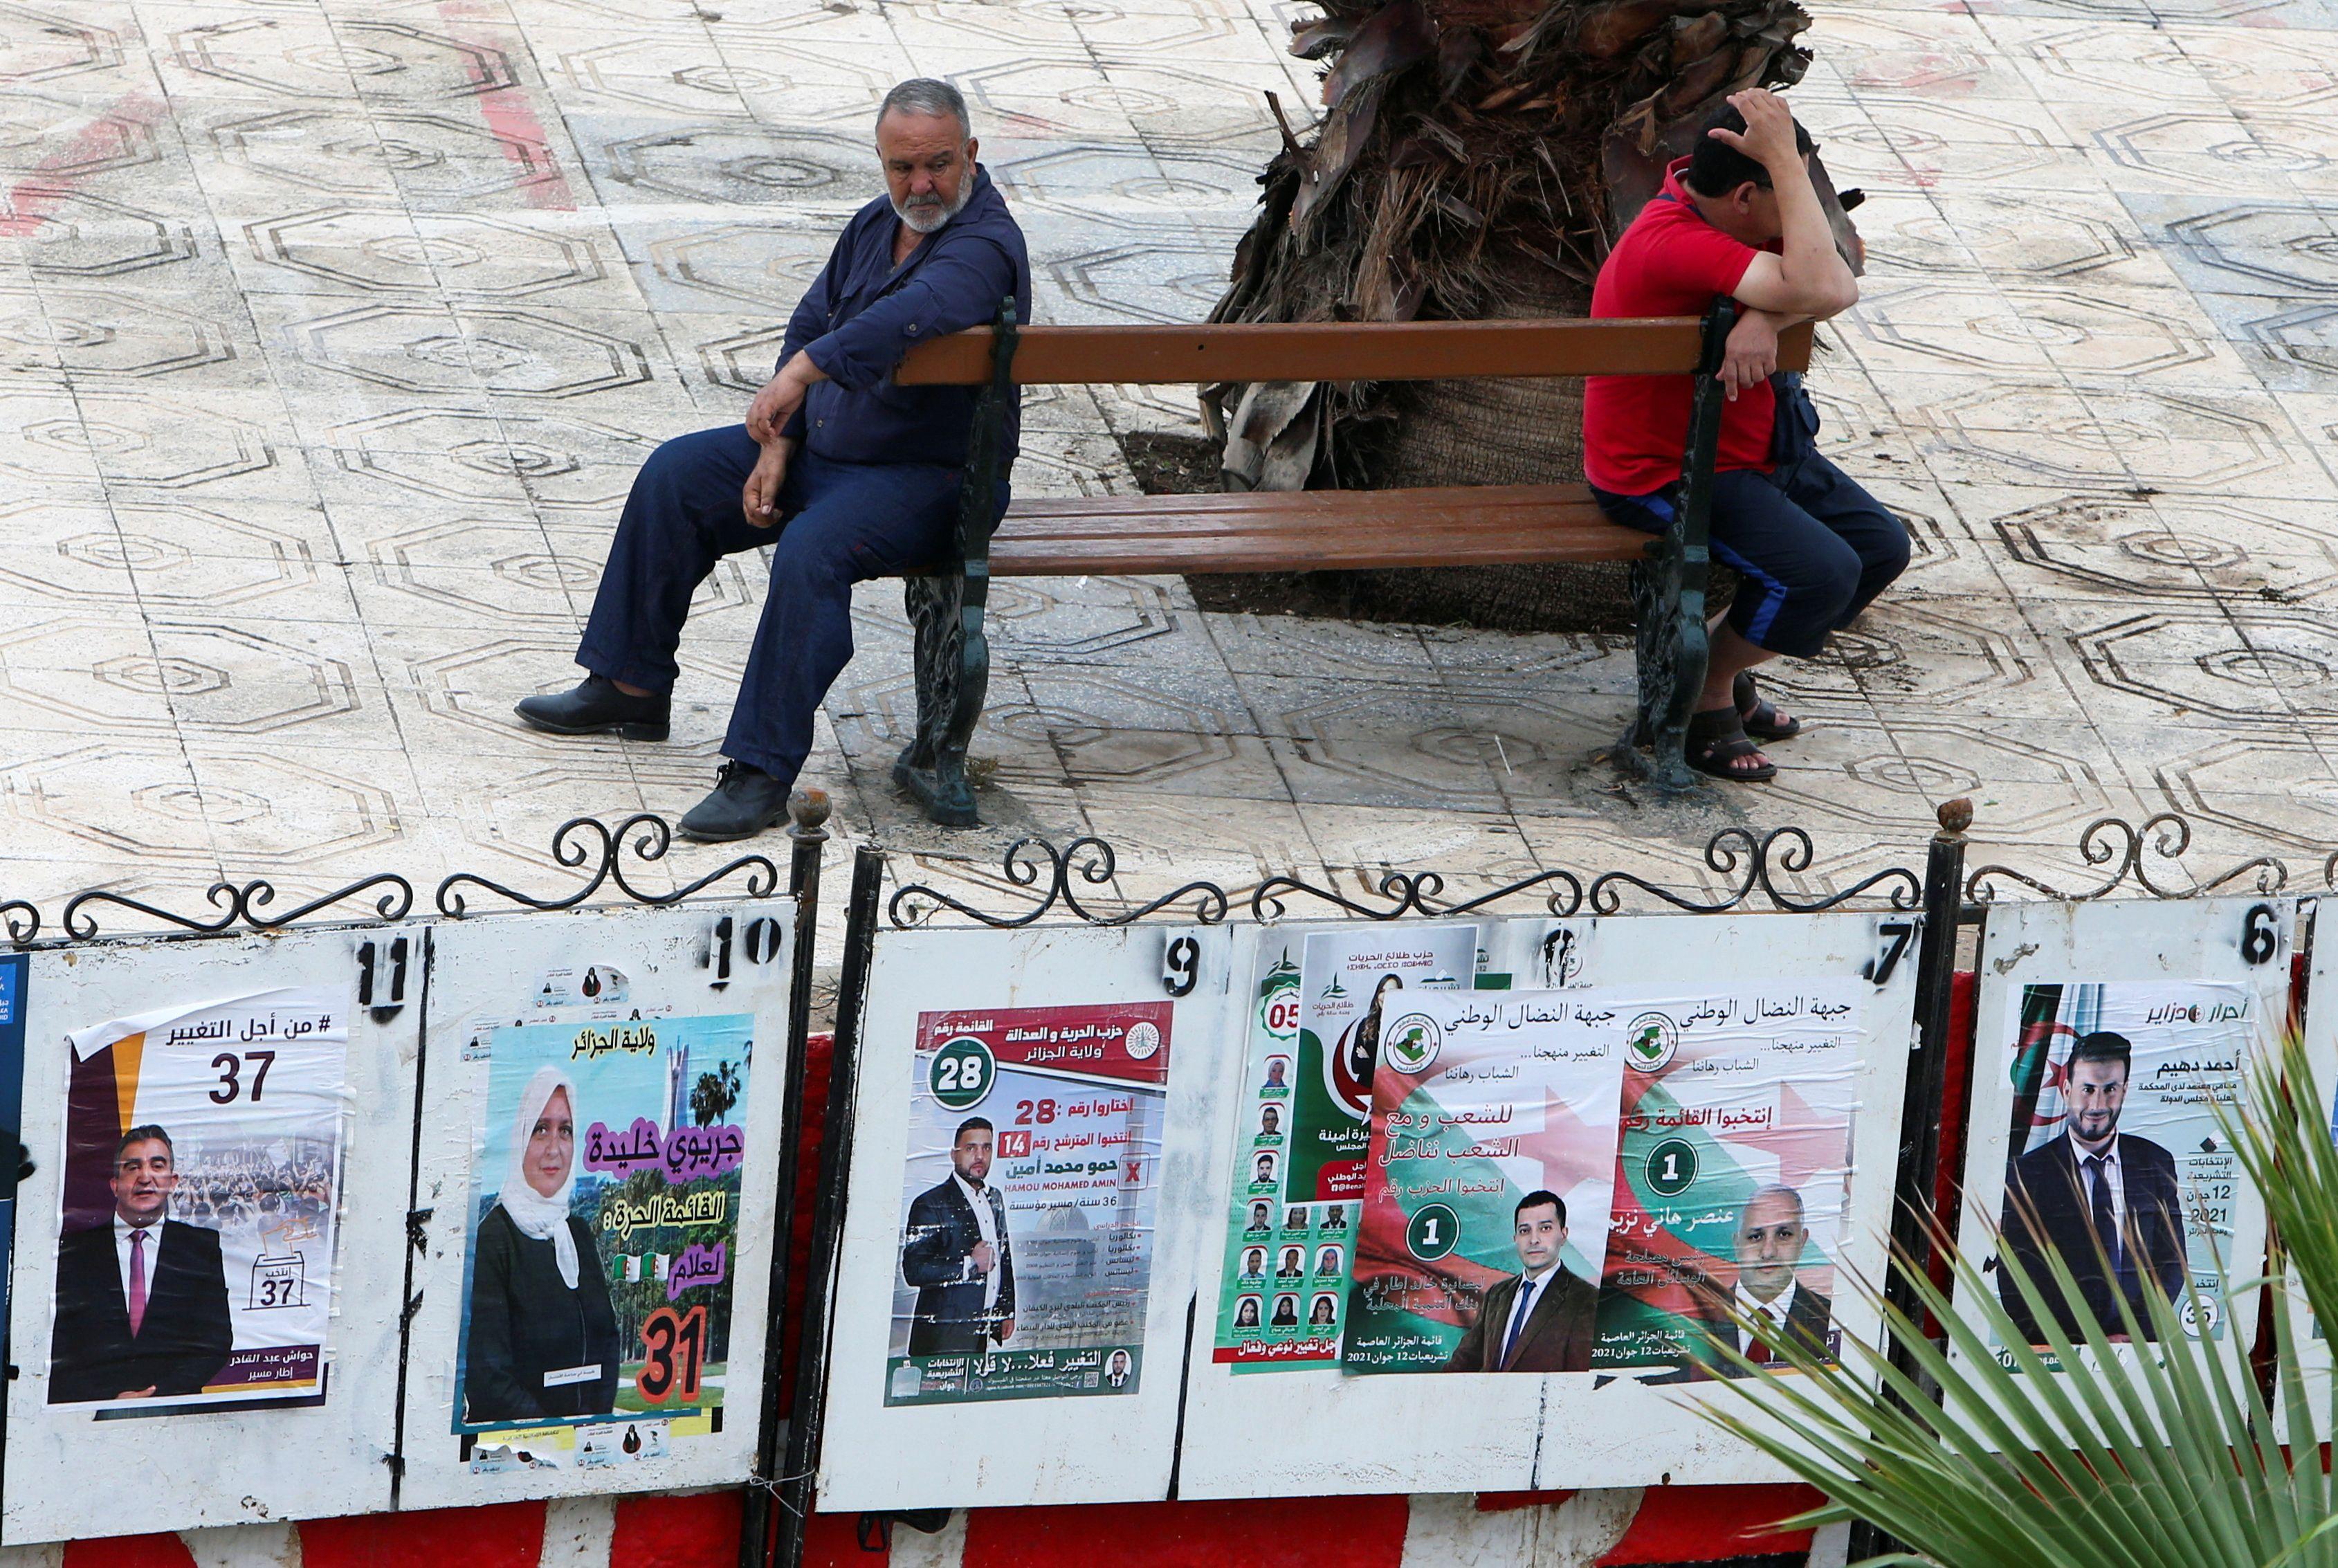 Men sit near parliamentary election campaign posters, ahead of the legislative elections, in Algiers, Algeria June 6, 2021. REUTERS/Ramzi Boudina